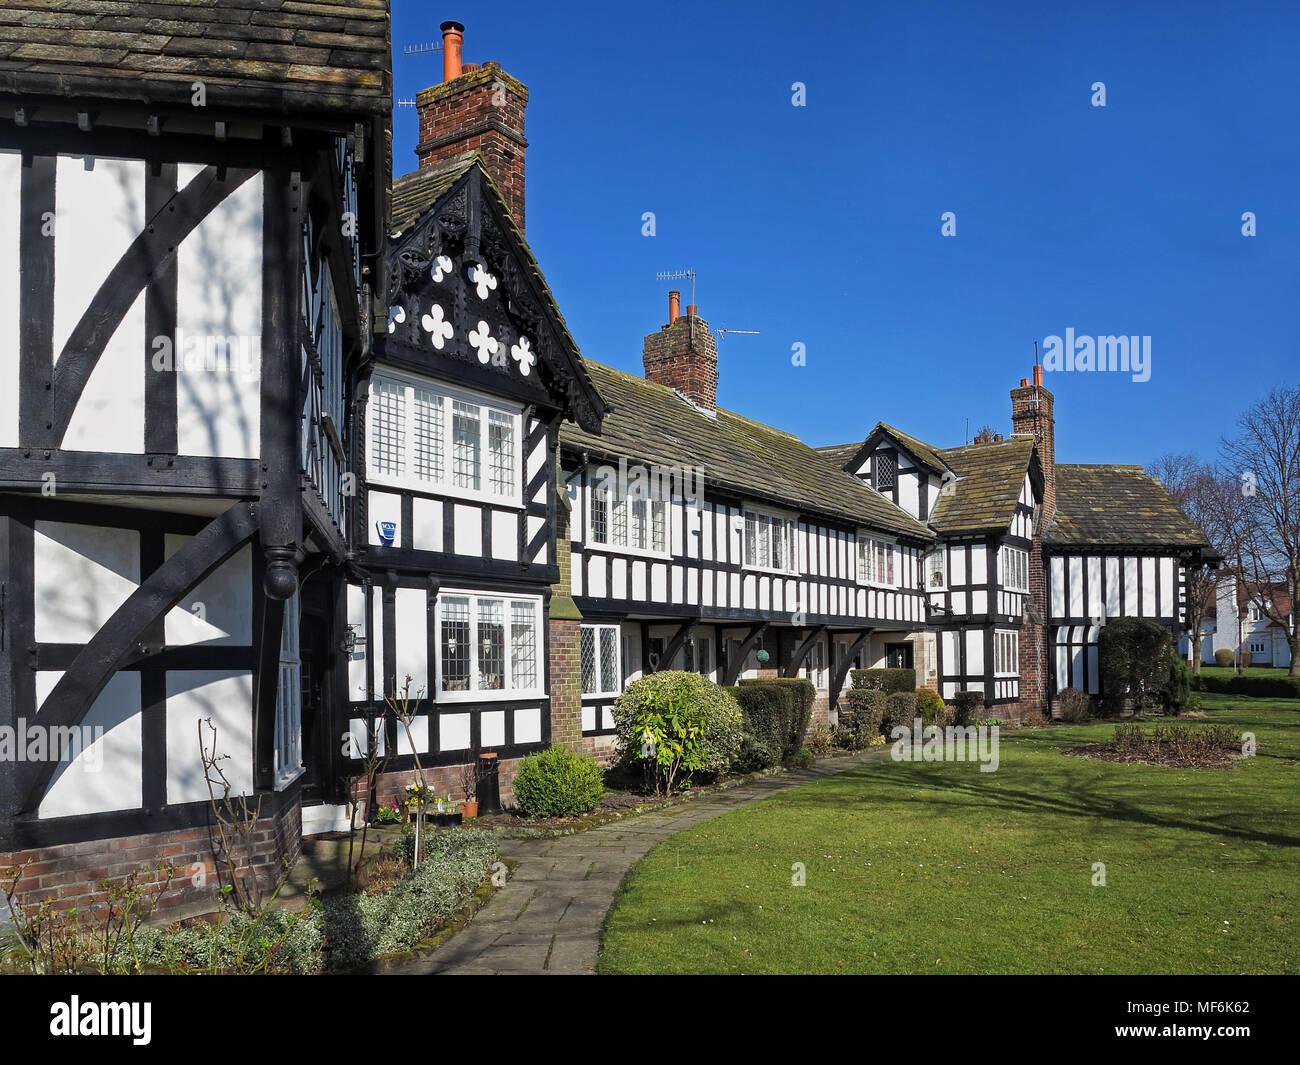 Tudor-styled property at Port Sunlight - Stock Image